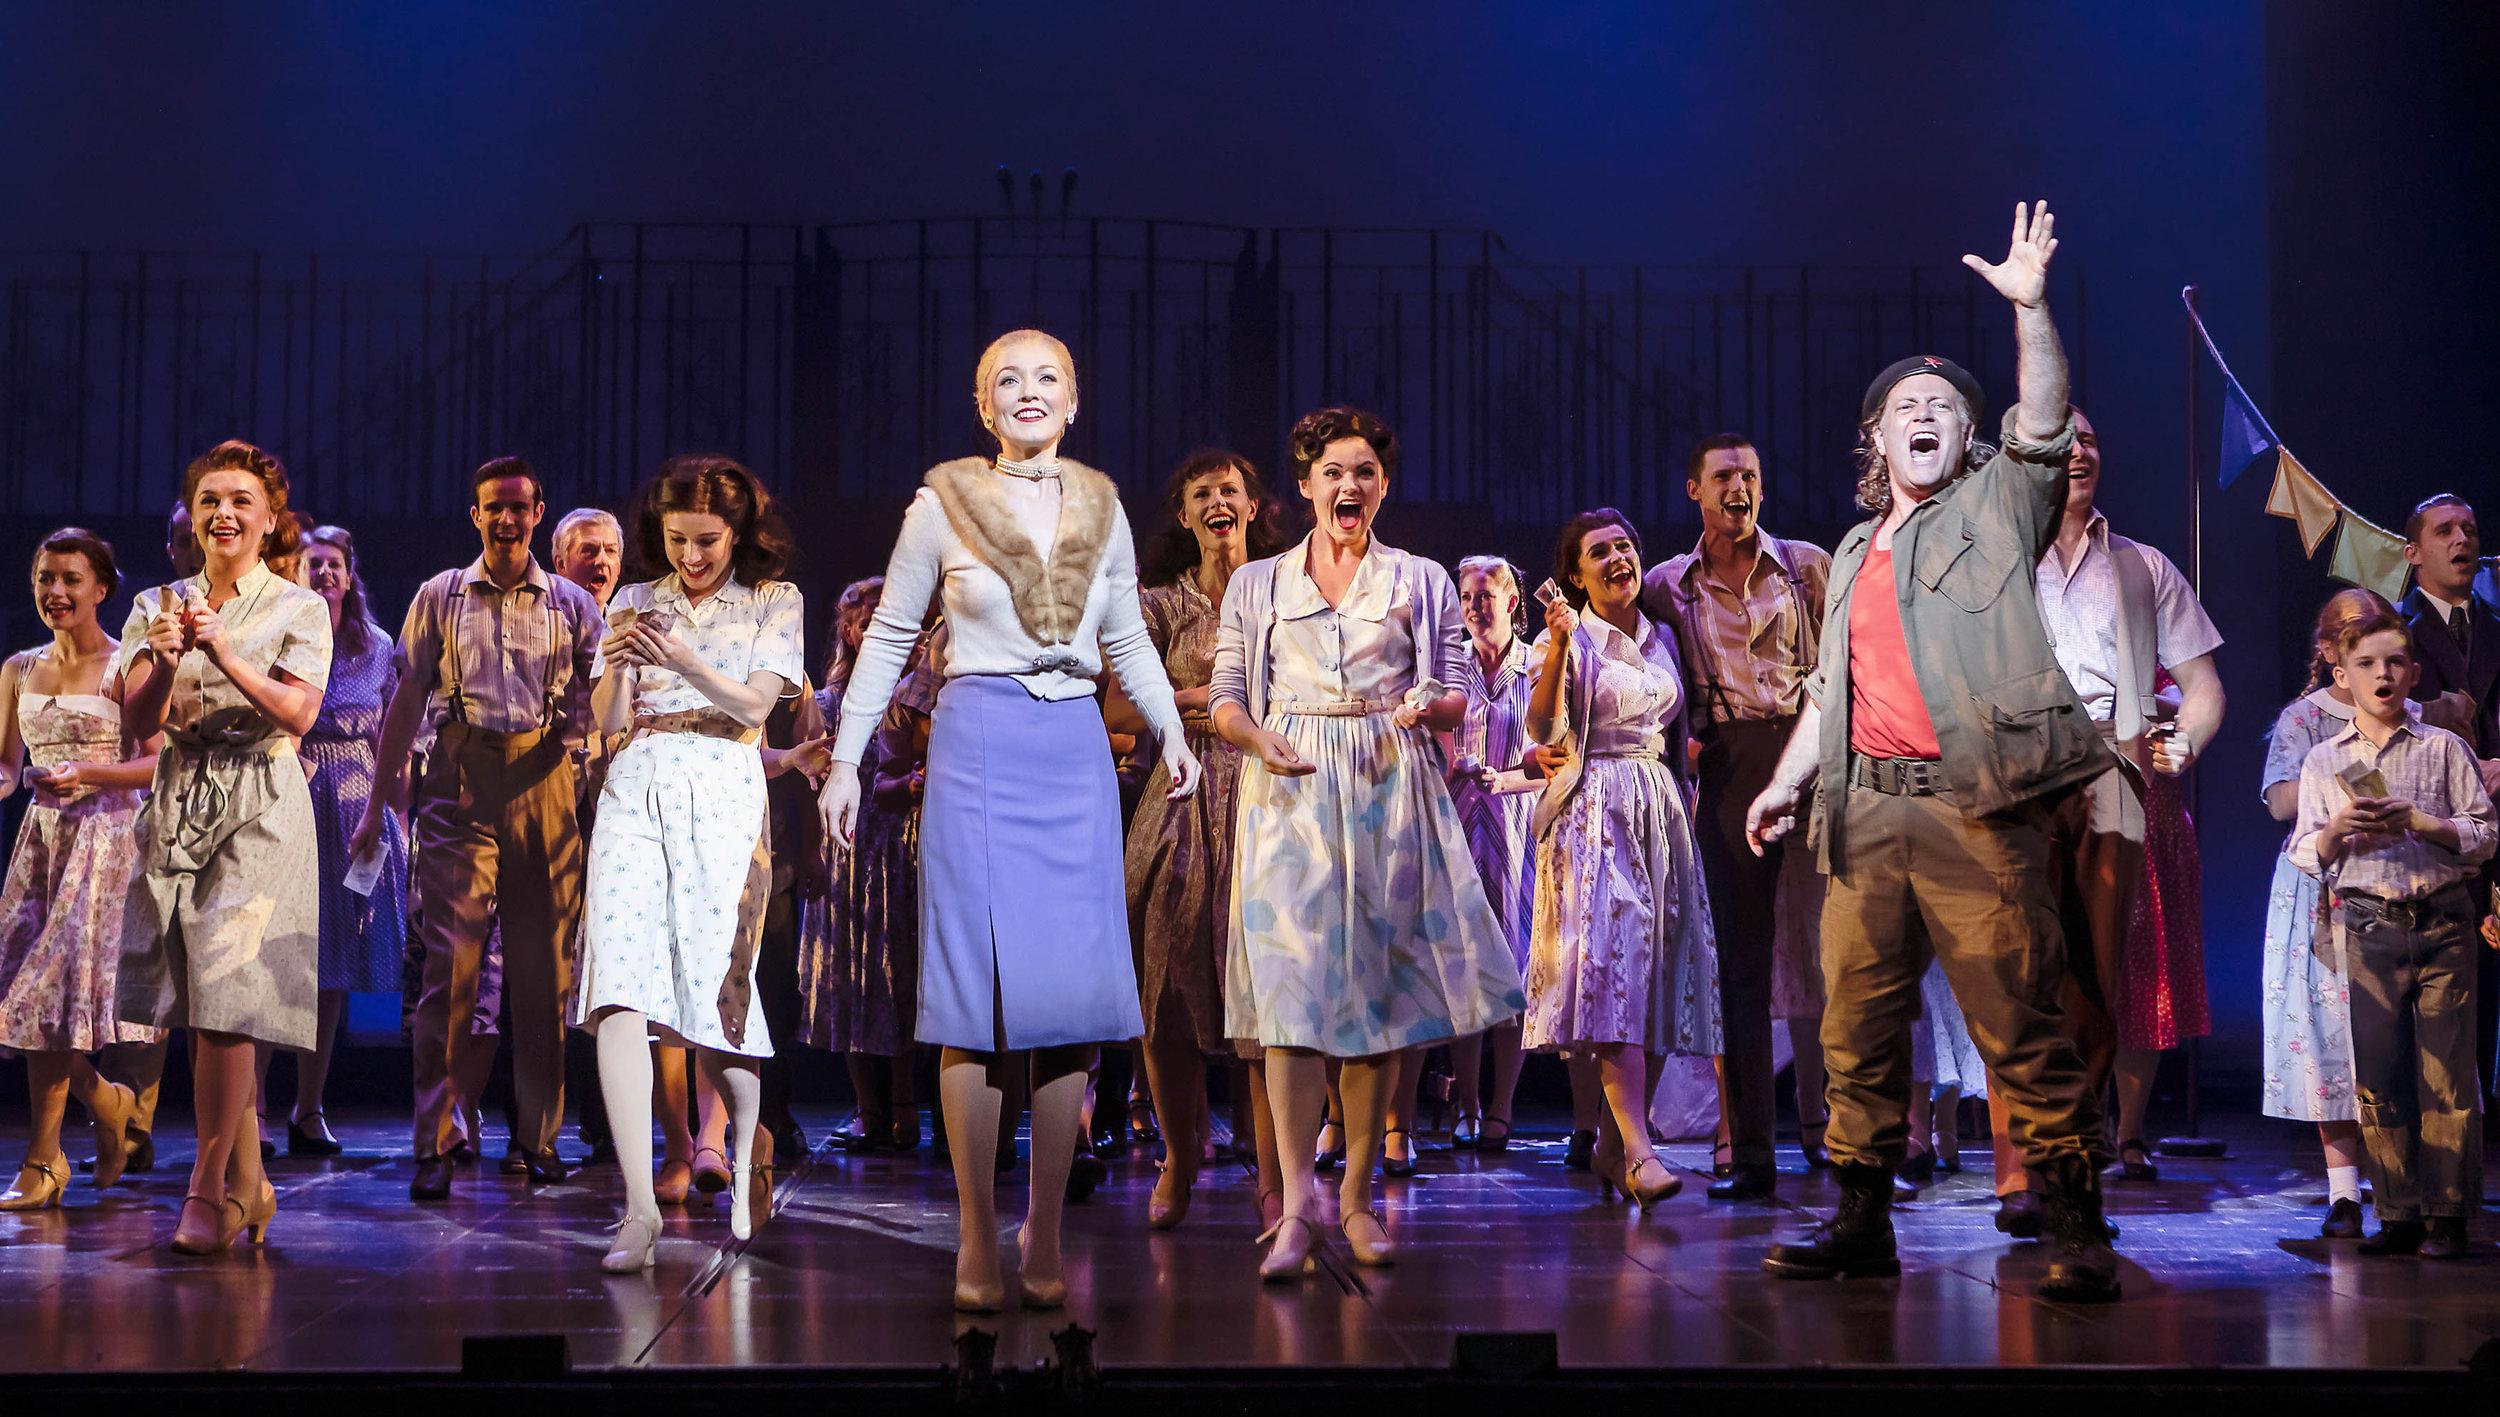 foto credit: Theatre Royal